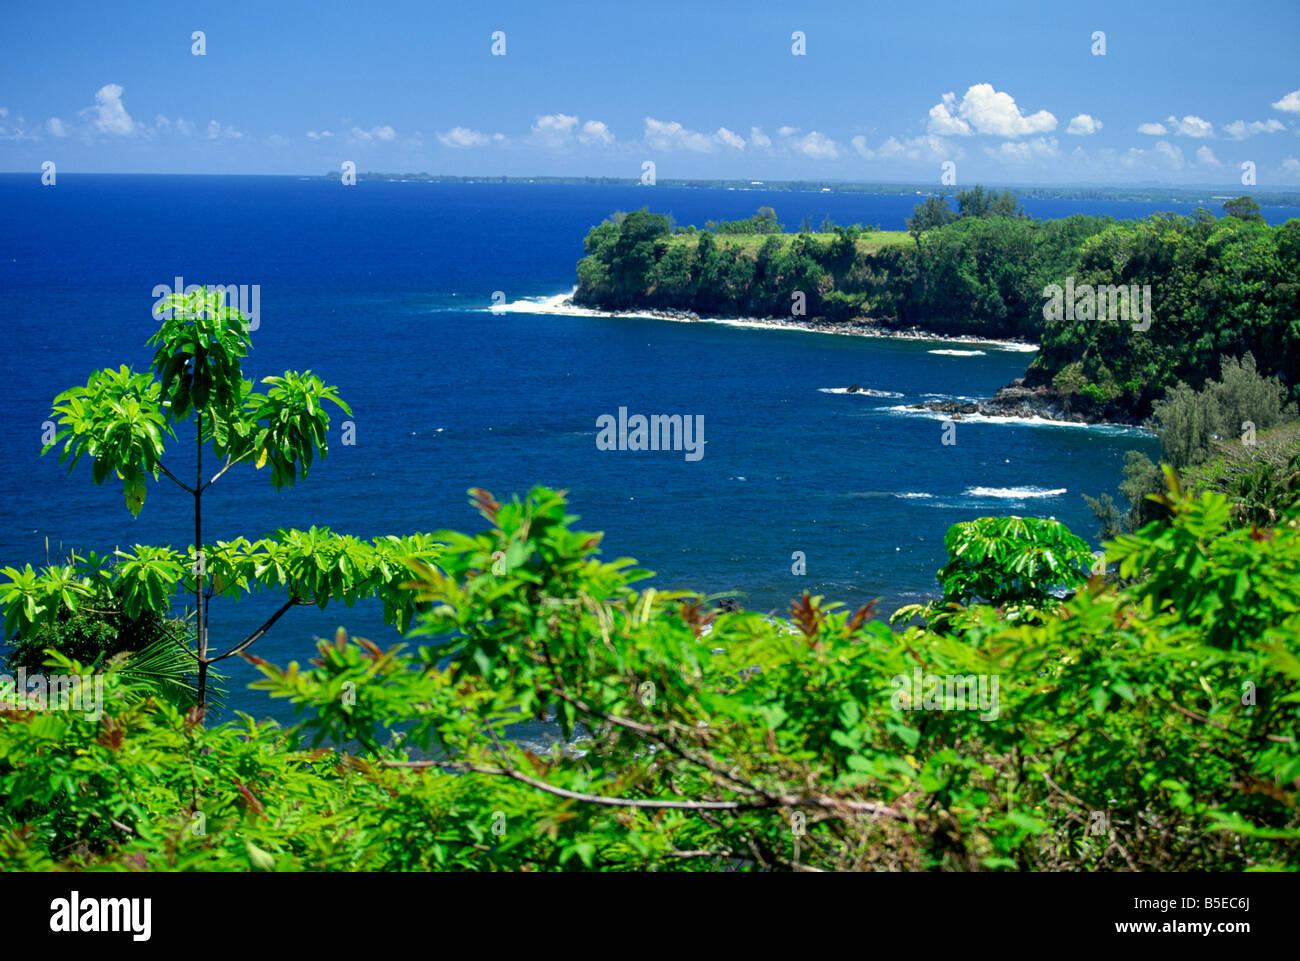 Onomea Bay by the Pepeekeo Four-Mile scenic drive on the Hamakua coast in the northeast of Hawaii, The Big Island, - Stock Image